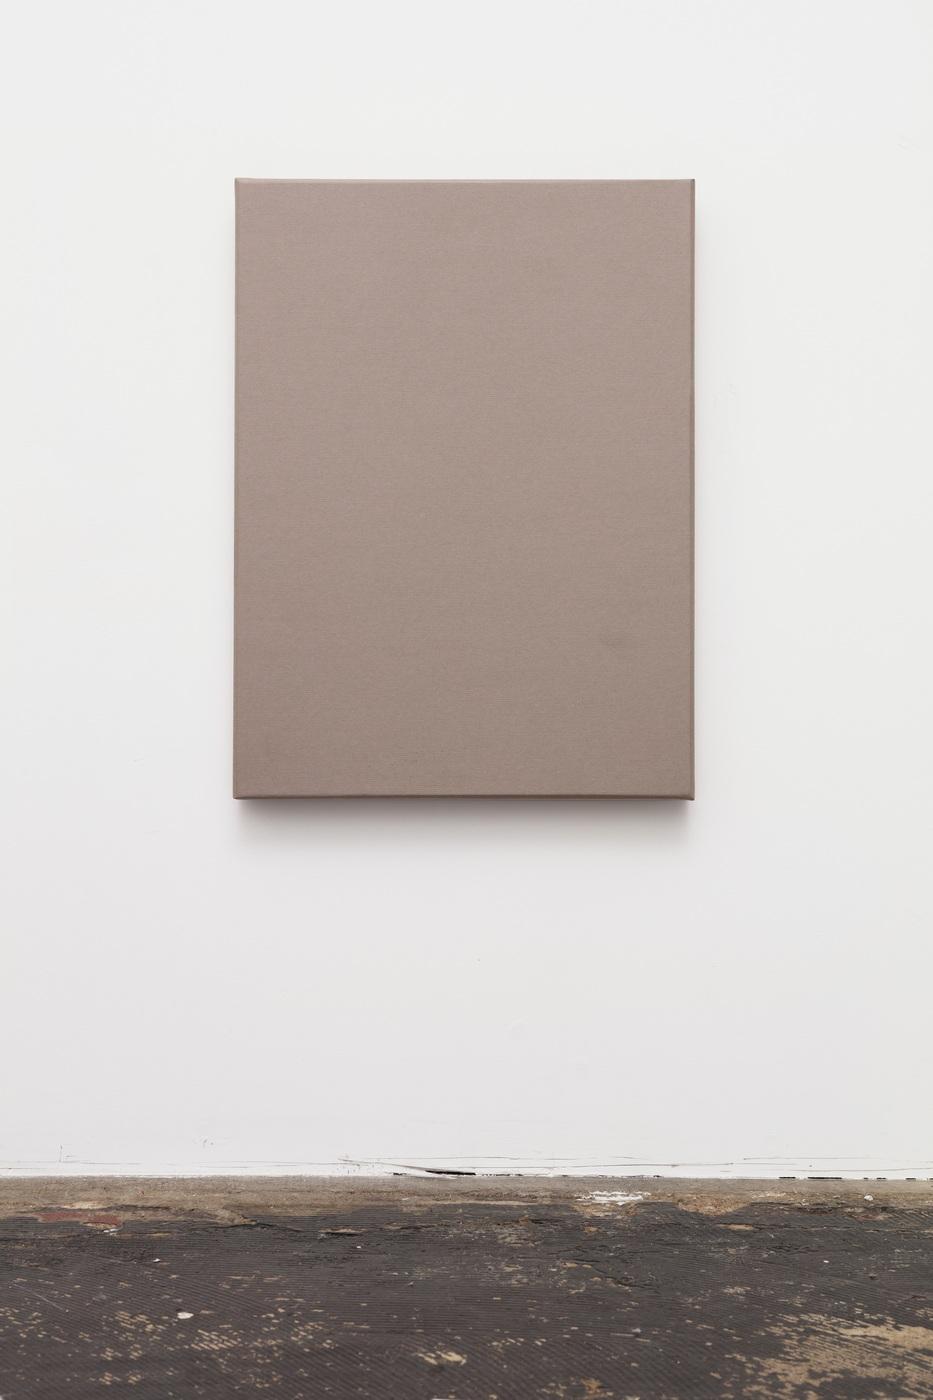 Jesse Stecklow, Collage Trap 22016